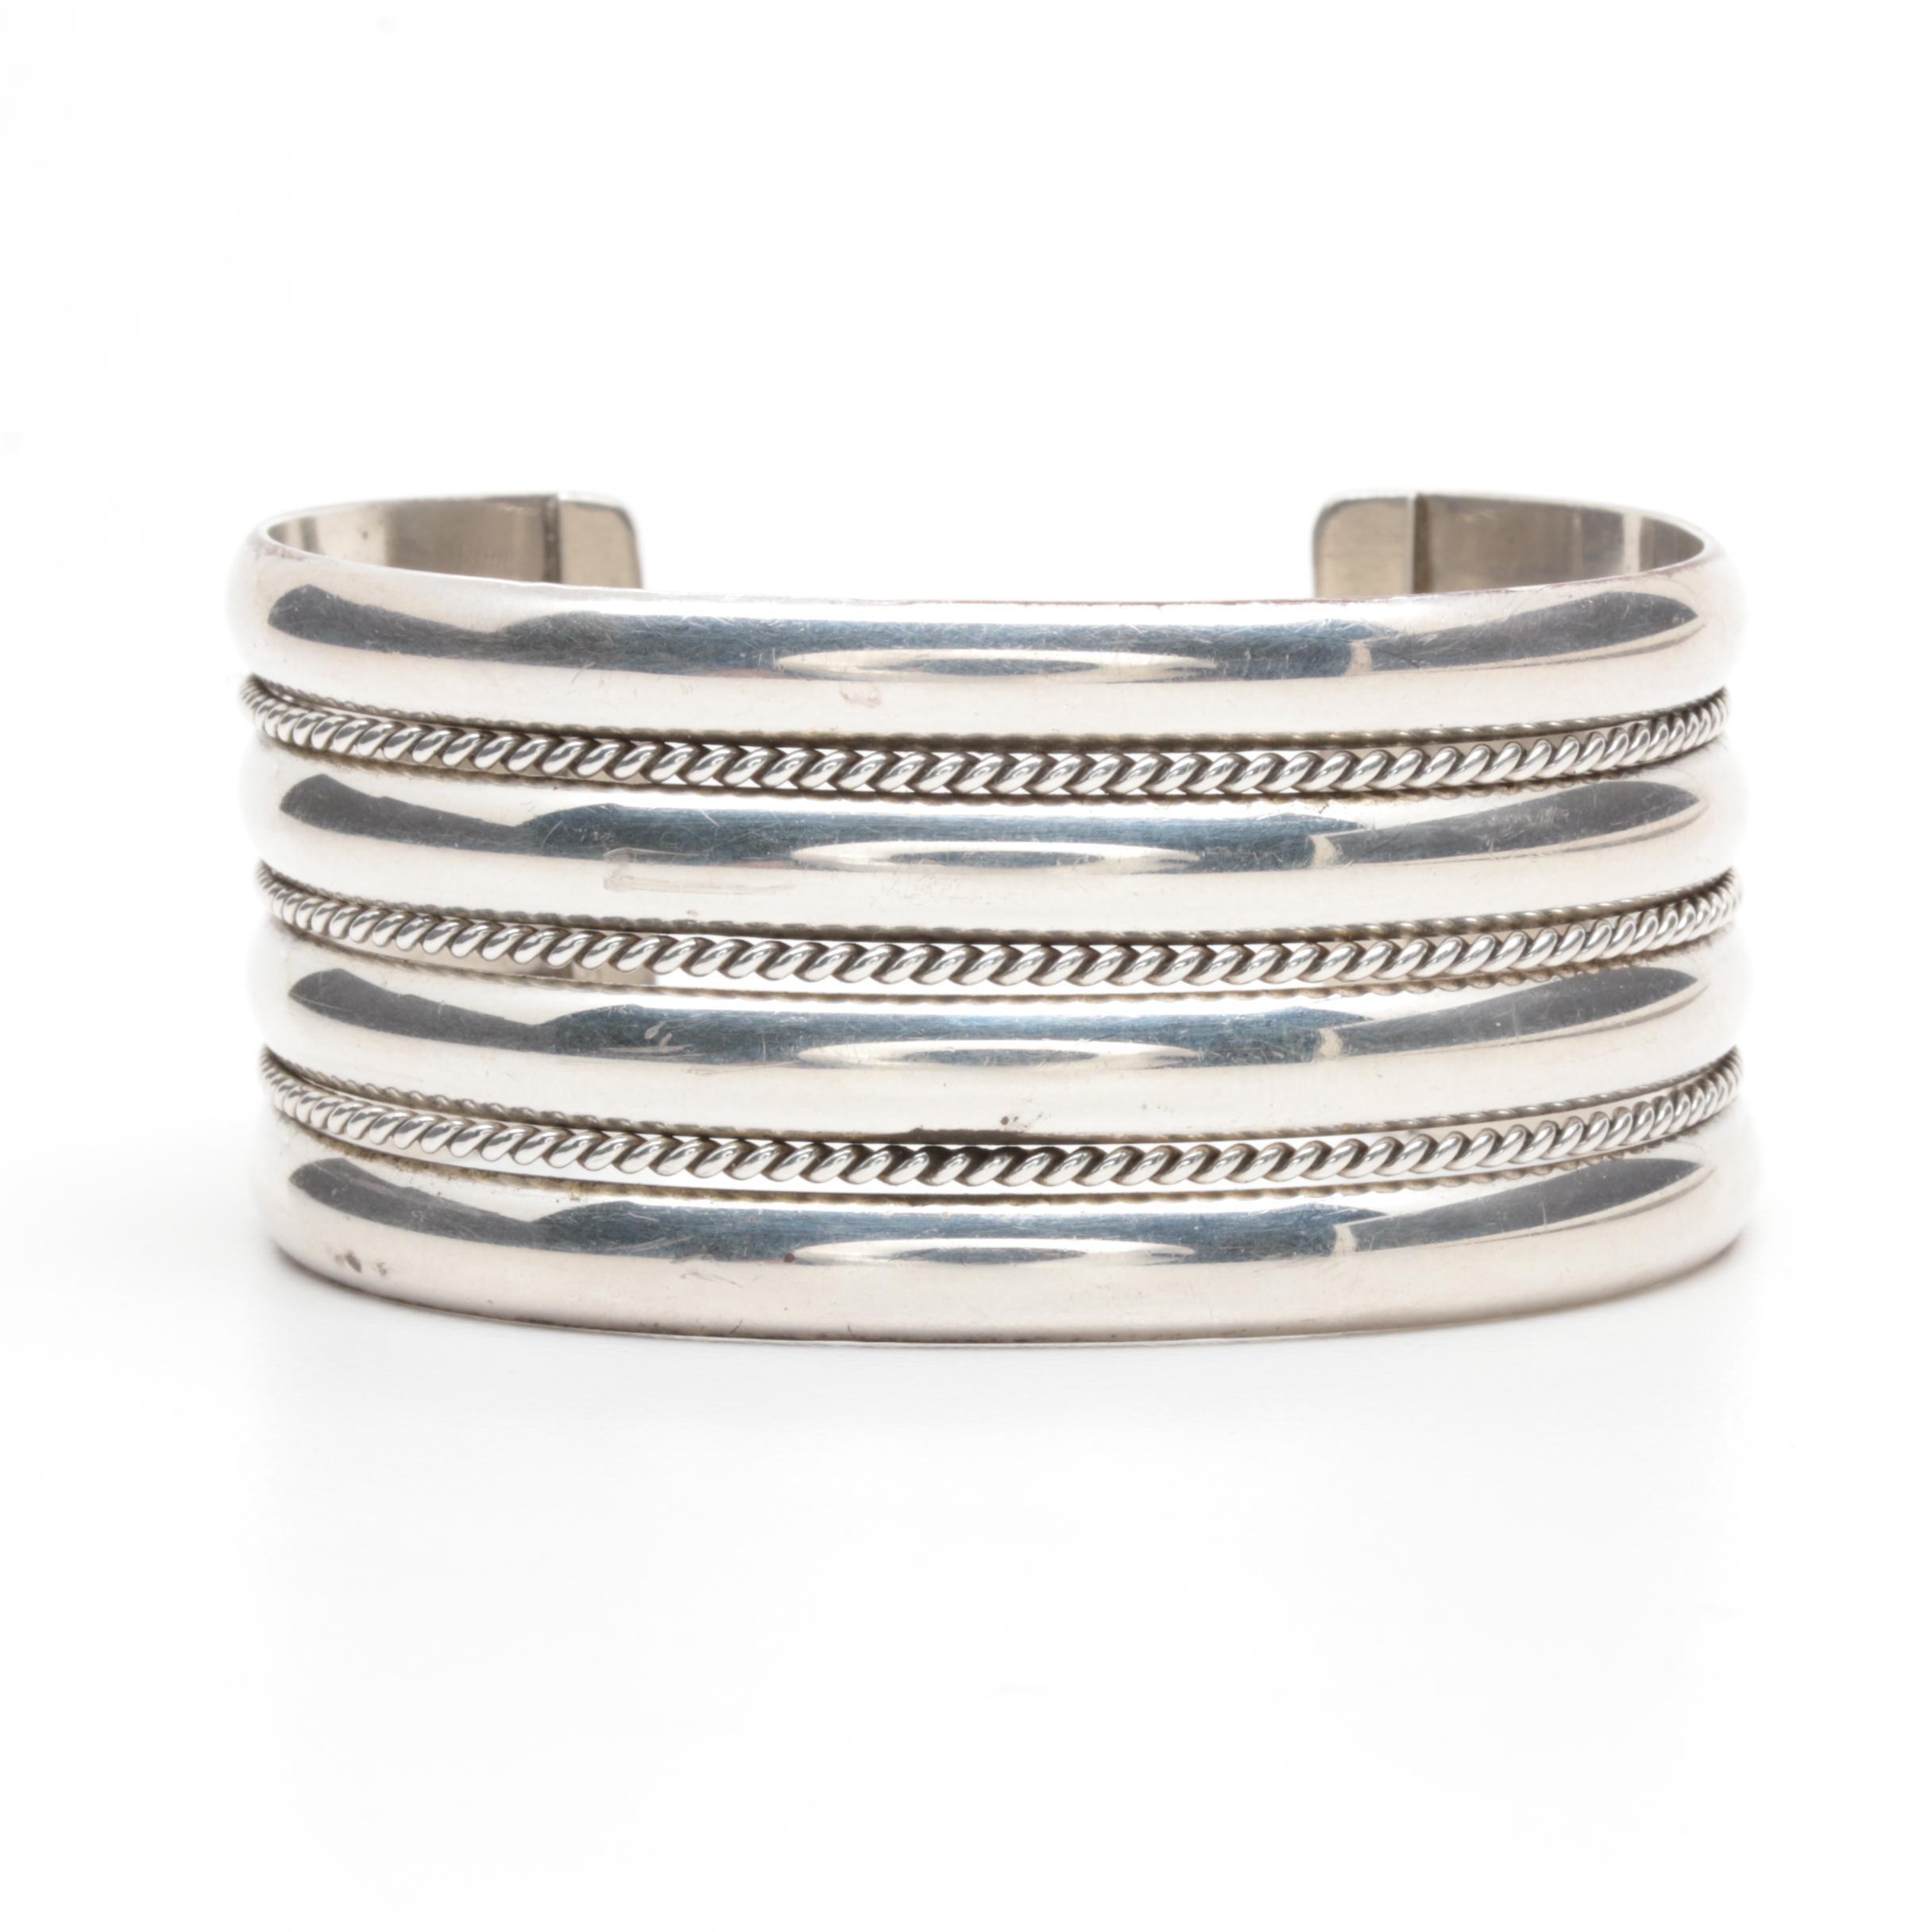 Tahe Family Navajo Diné Sterling Silver Cuff Bracelet